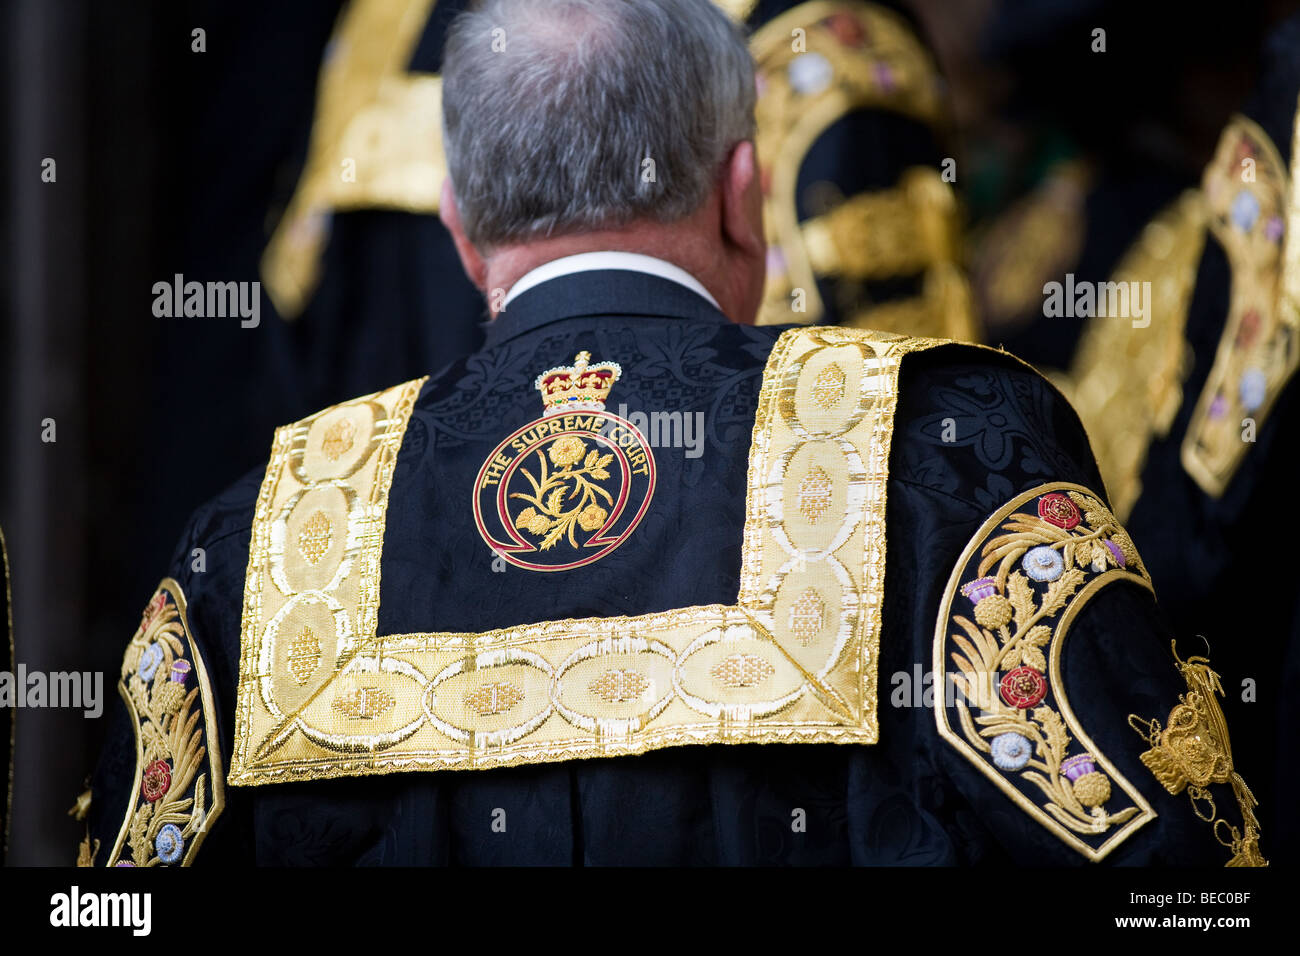 Supreme Court of the United Kingdom Justice robe logo emblem - Stock Image